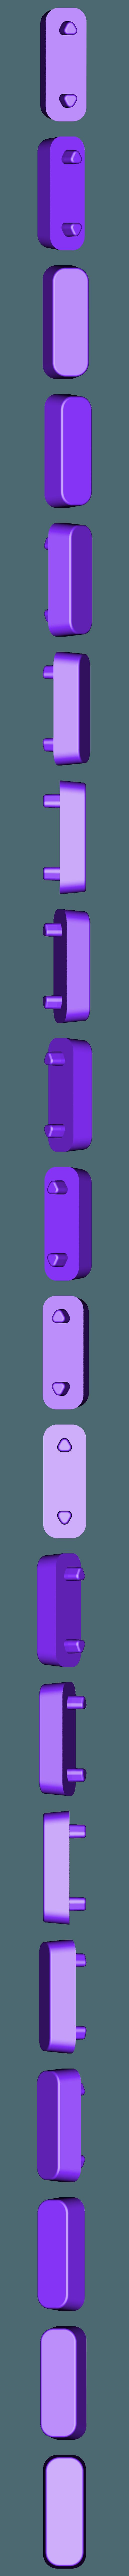 Toilet_Seat_Bumper_v1-0.STL Download free STL file Toilet Seat Bumper • 3D print design, WalterHsiao